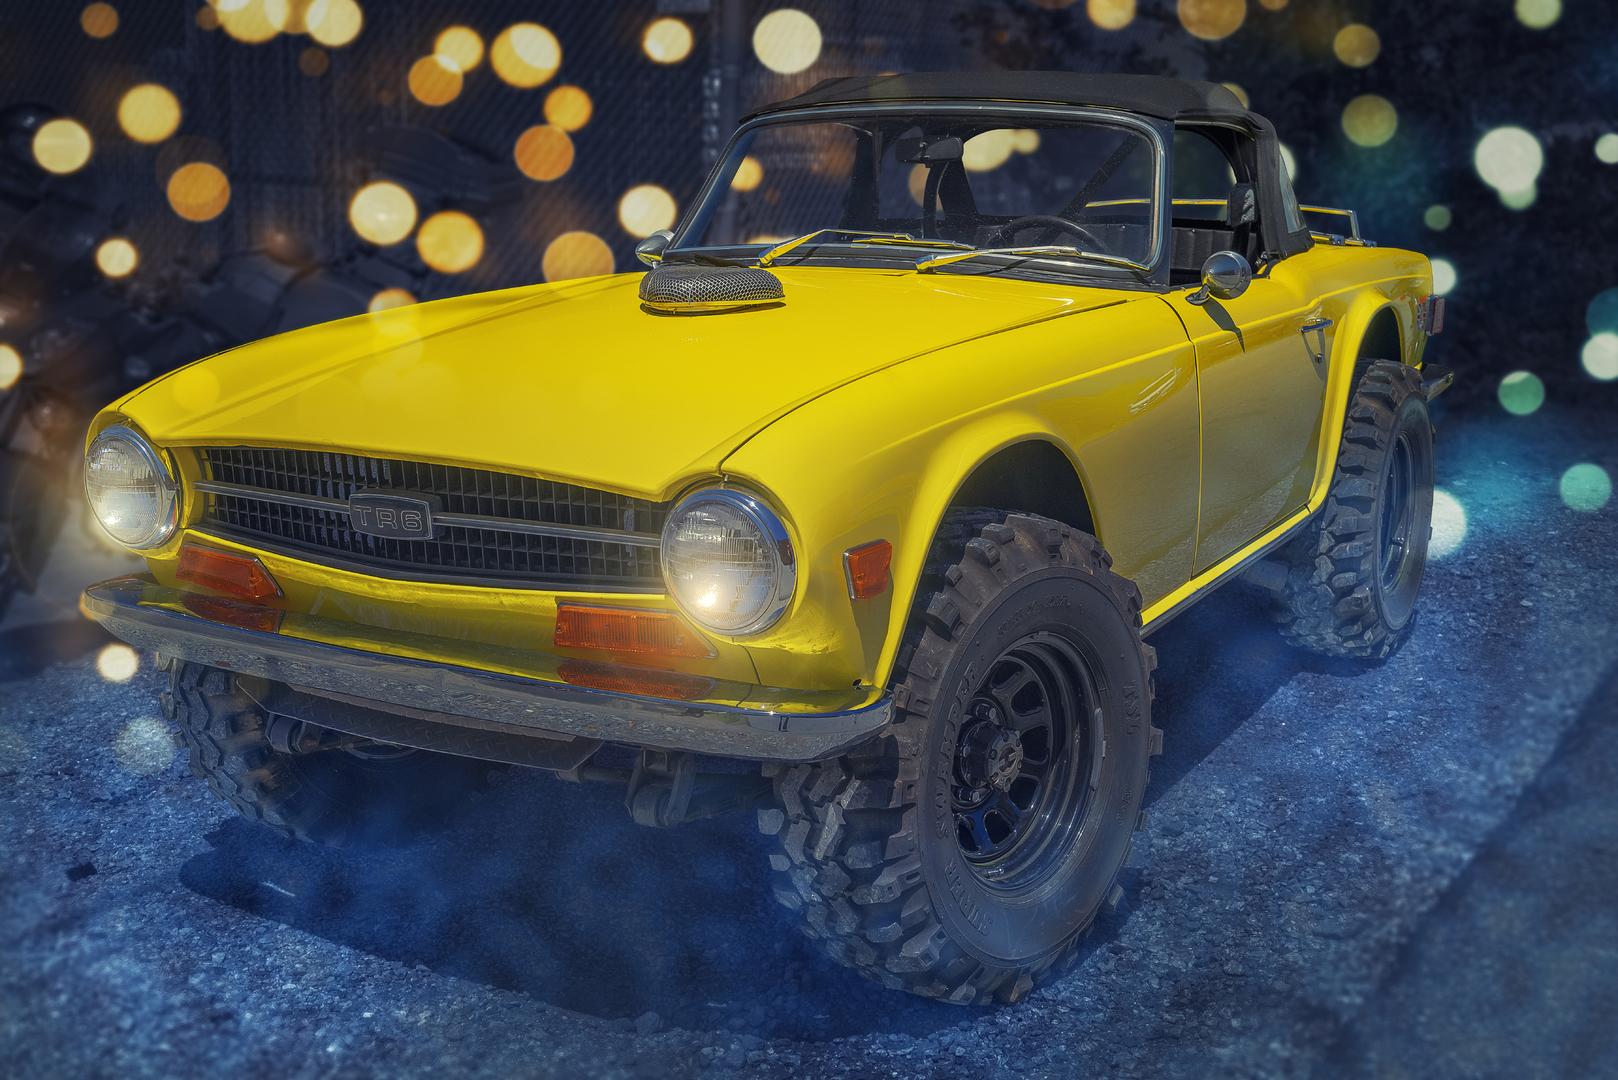 Yellow Classic Car Looks Great.